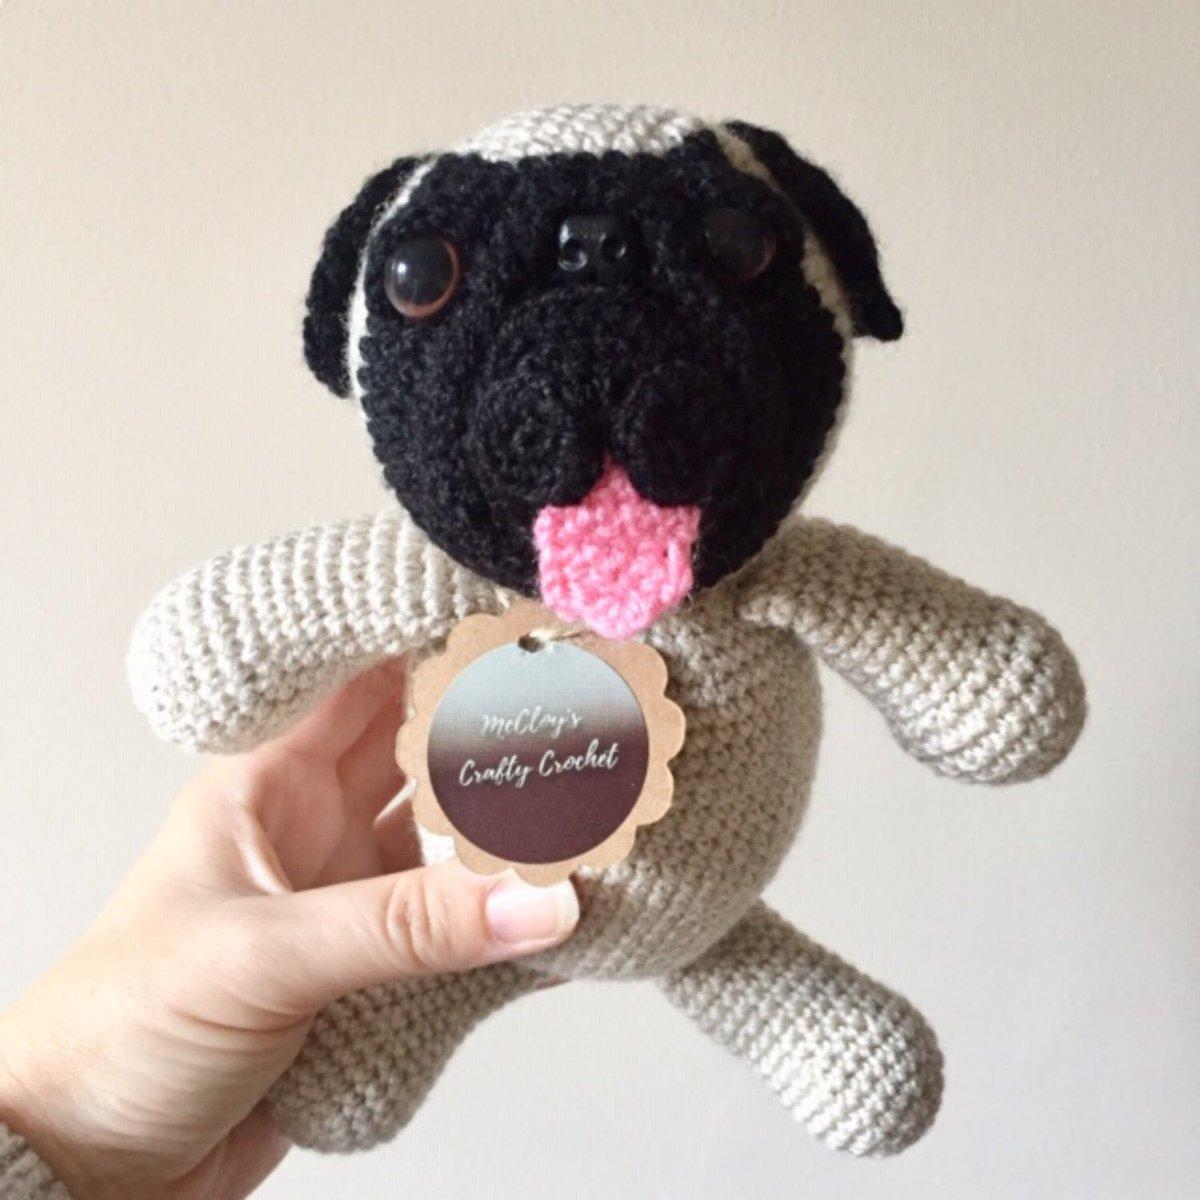 Patrick the pug crochet pattern | Amiguroom Toys | 1200x1200